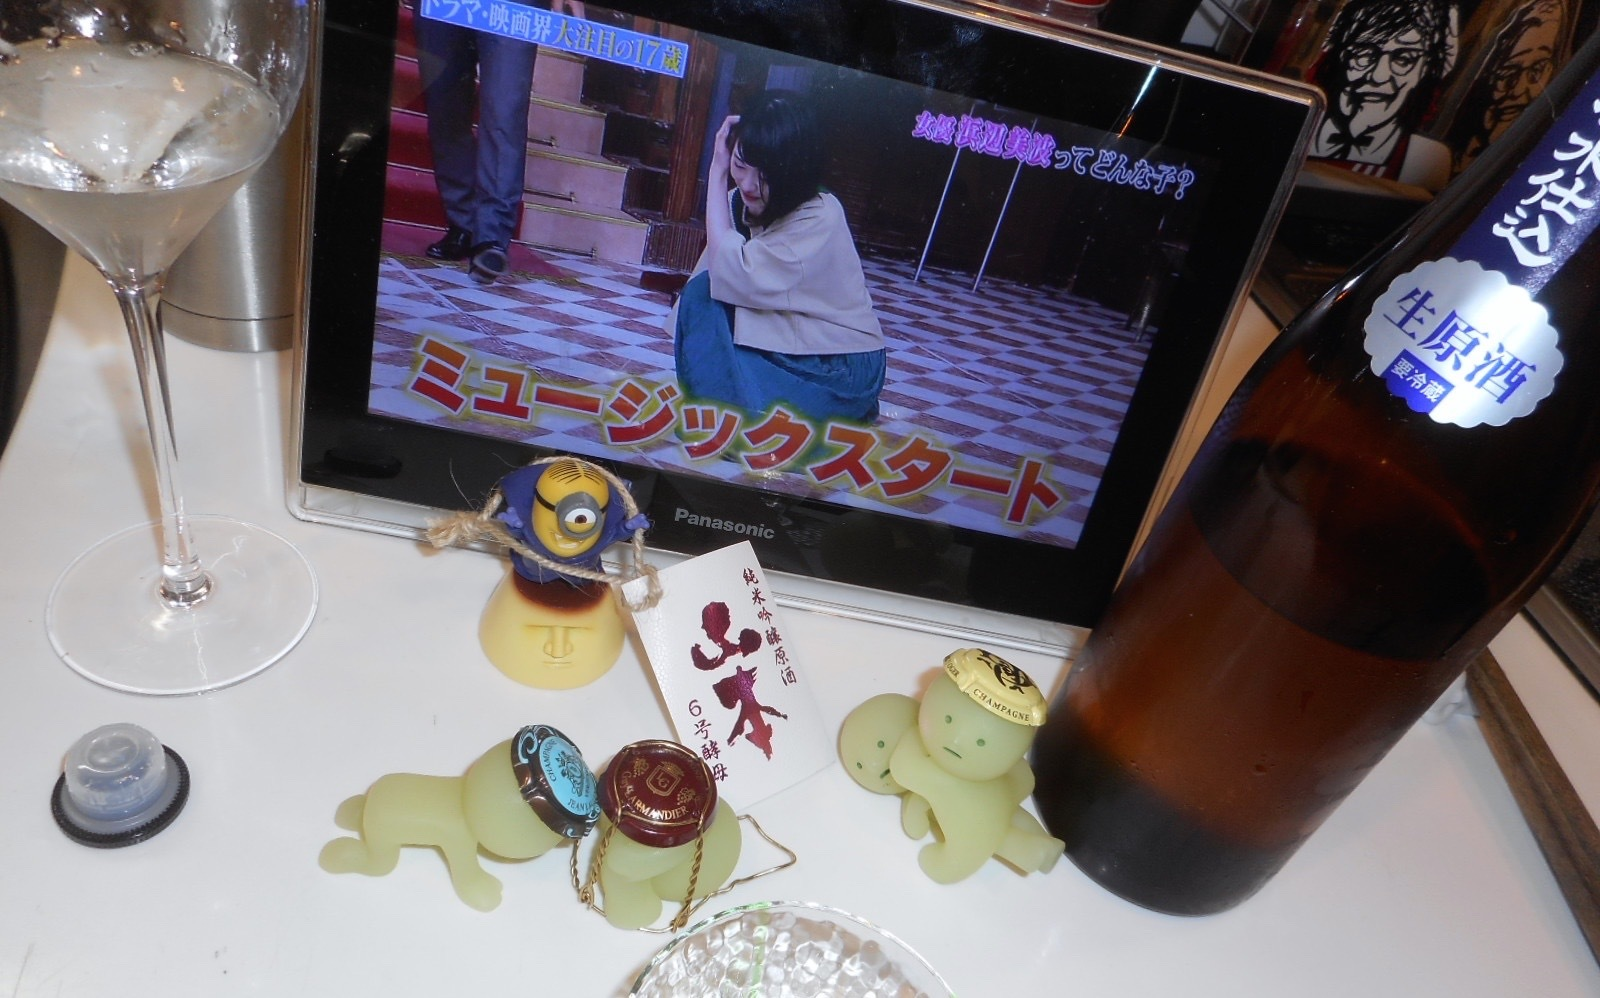 yamamoto_6gou29by7.jpg